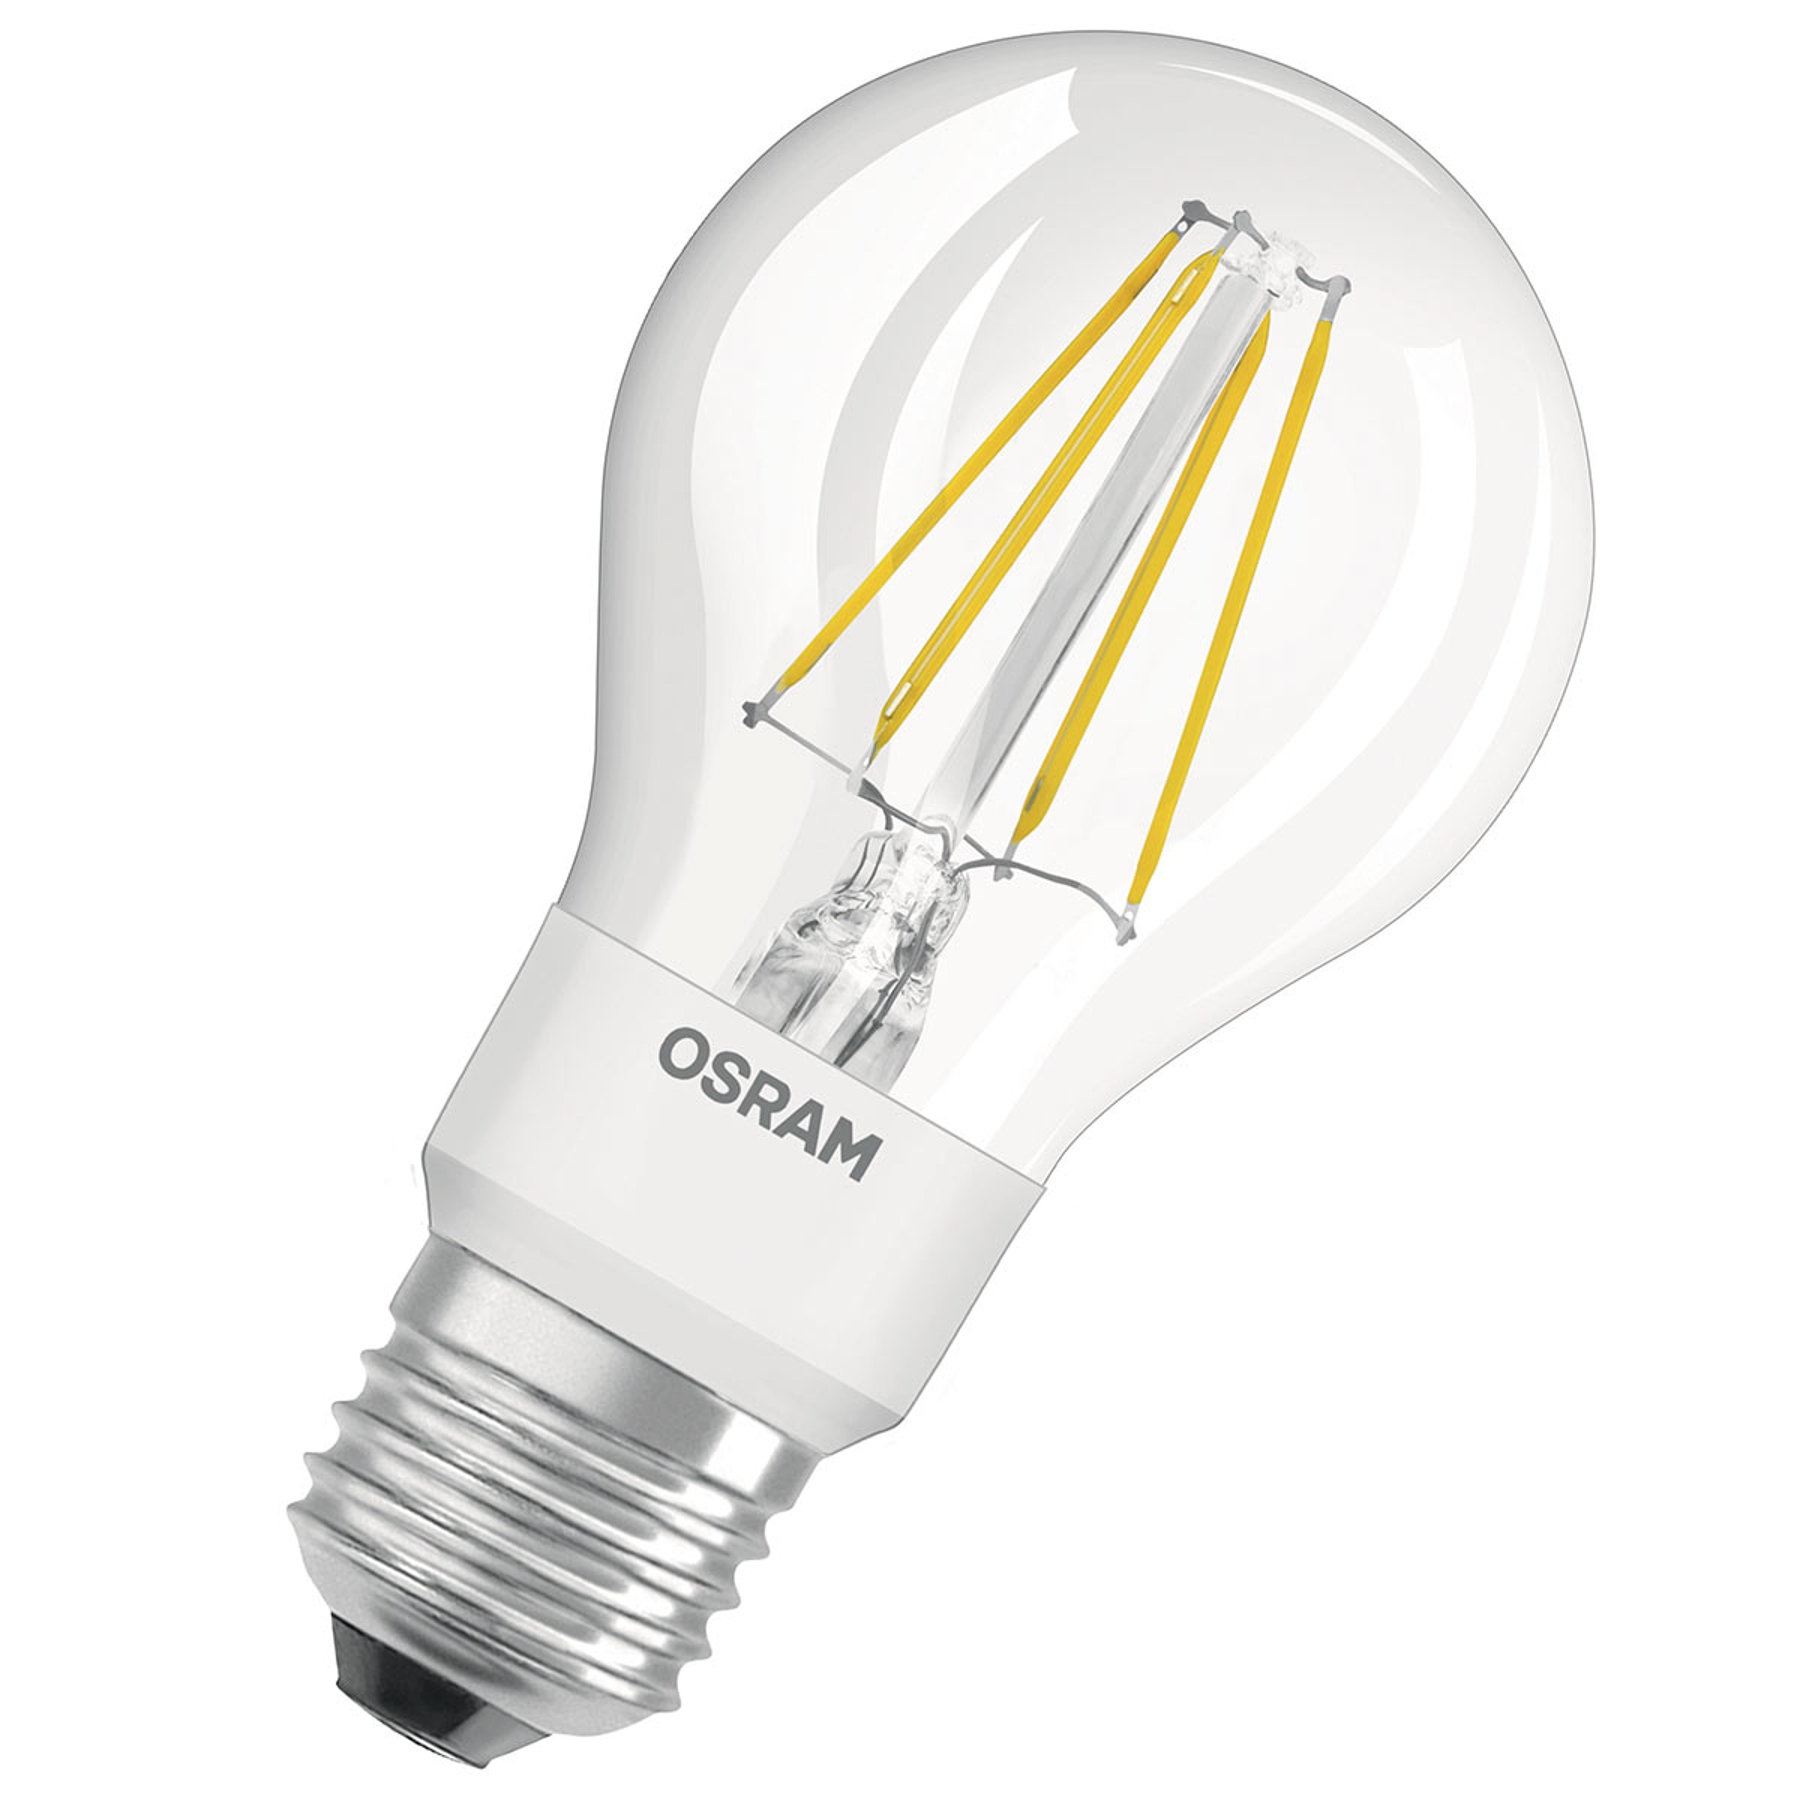 OSRAM LED-Lampe 4,5W Star+ GLOWdim Filament klar